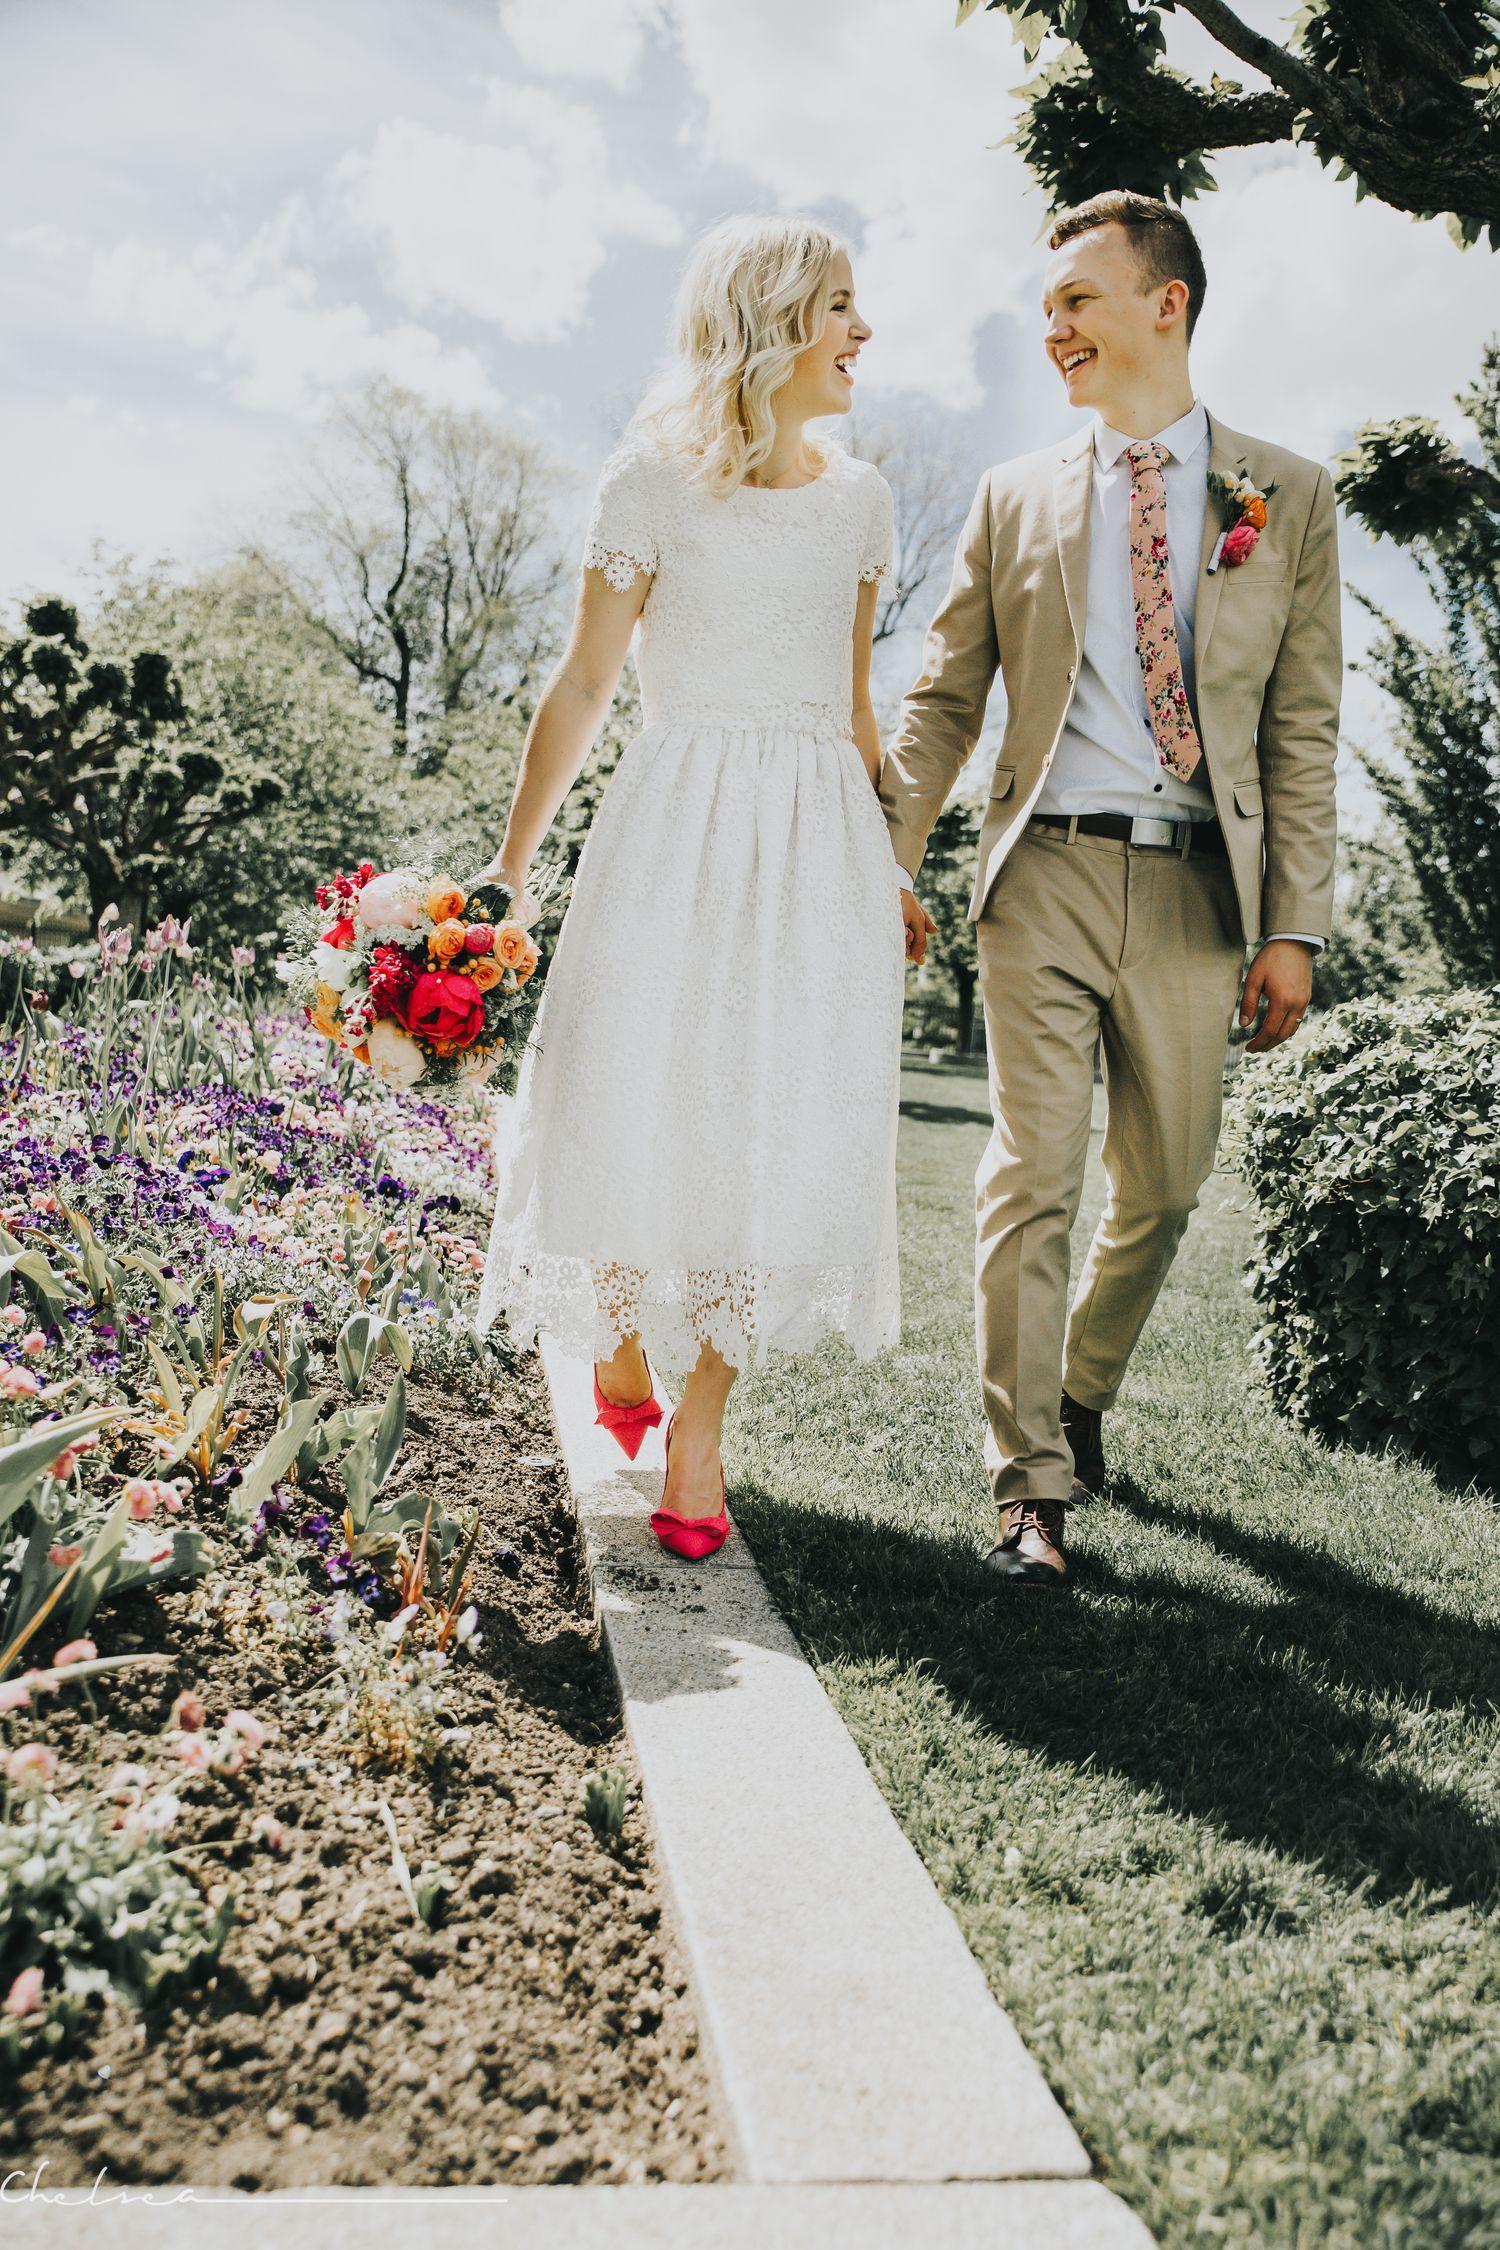 Pin By Eliza Bradford On I Can Hear The Bells Wedding Dress Shopping Bridal Gowns Dream Wedding Dresses